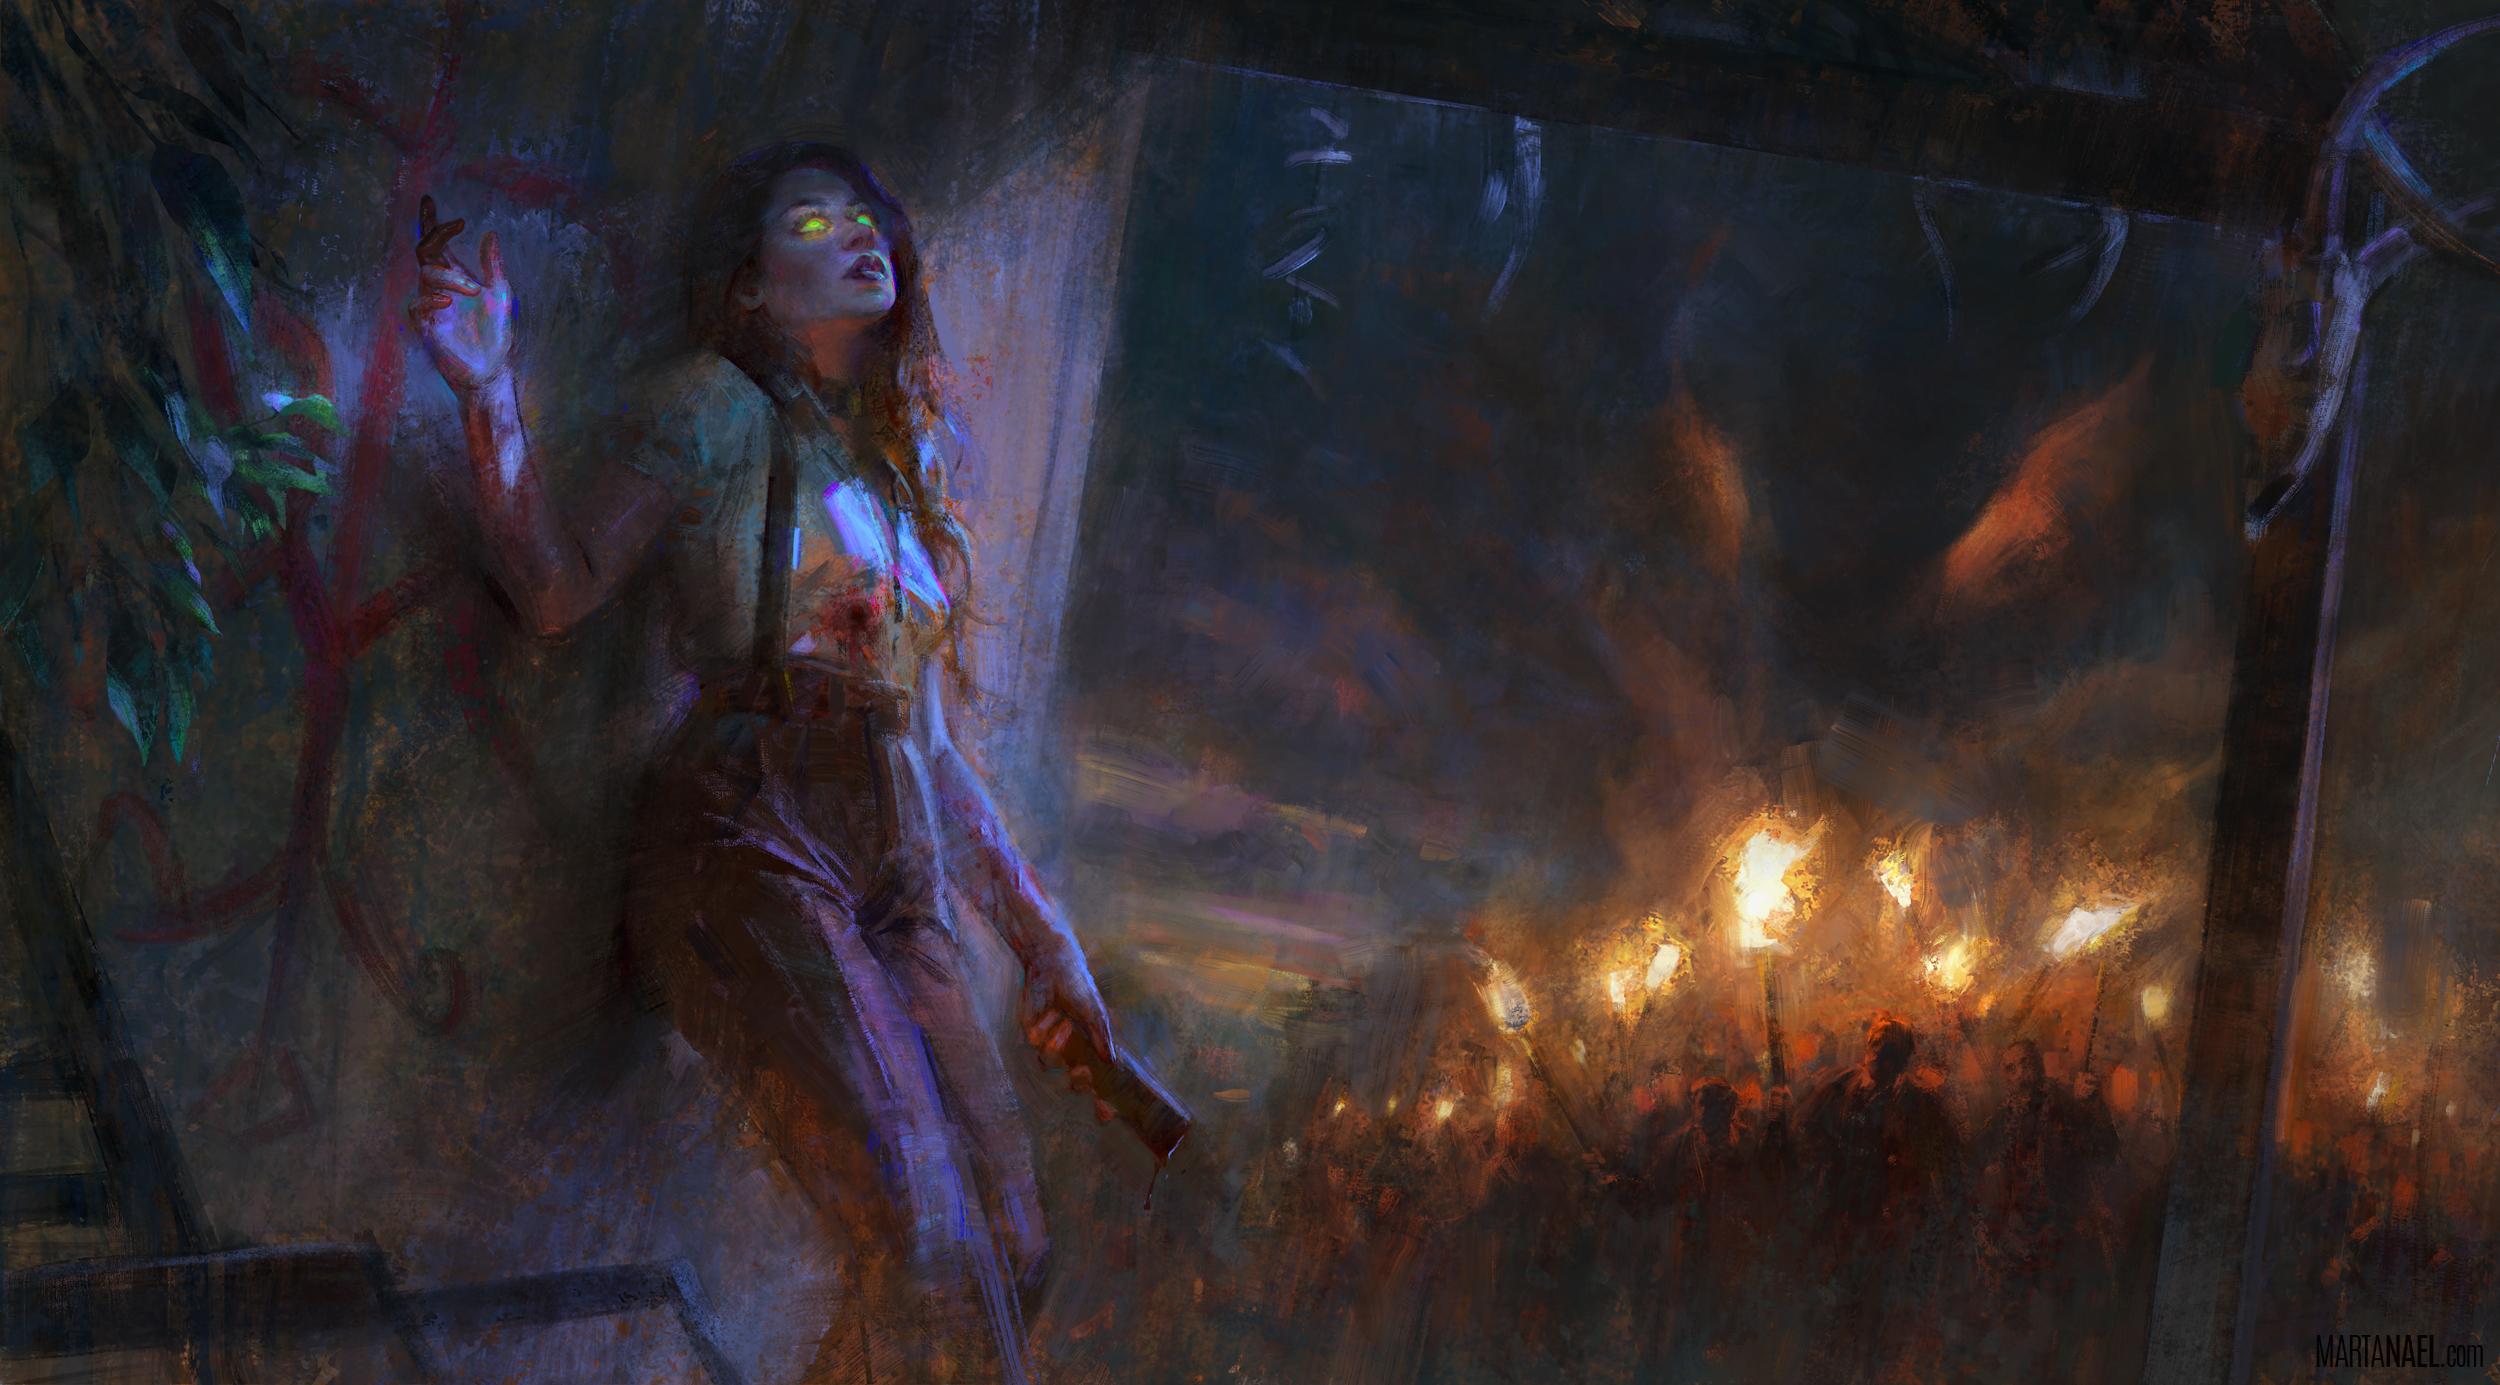 Laura - Spooky South by MartaNael